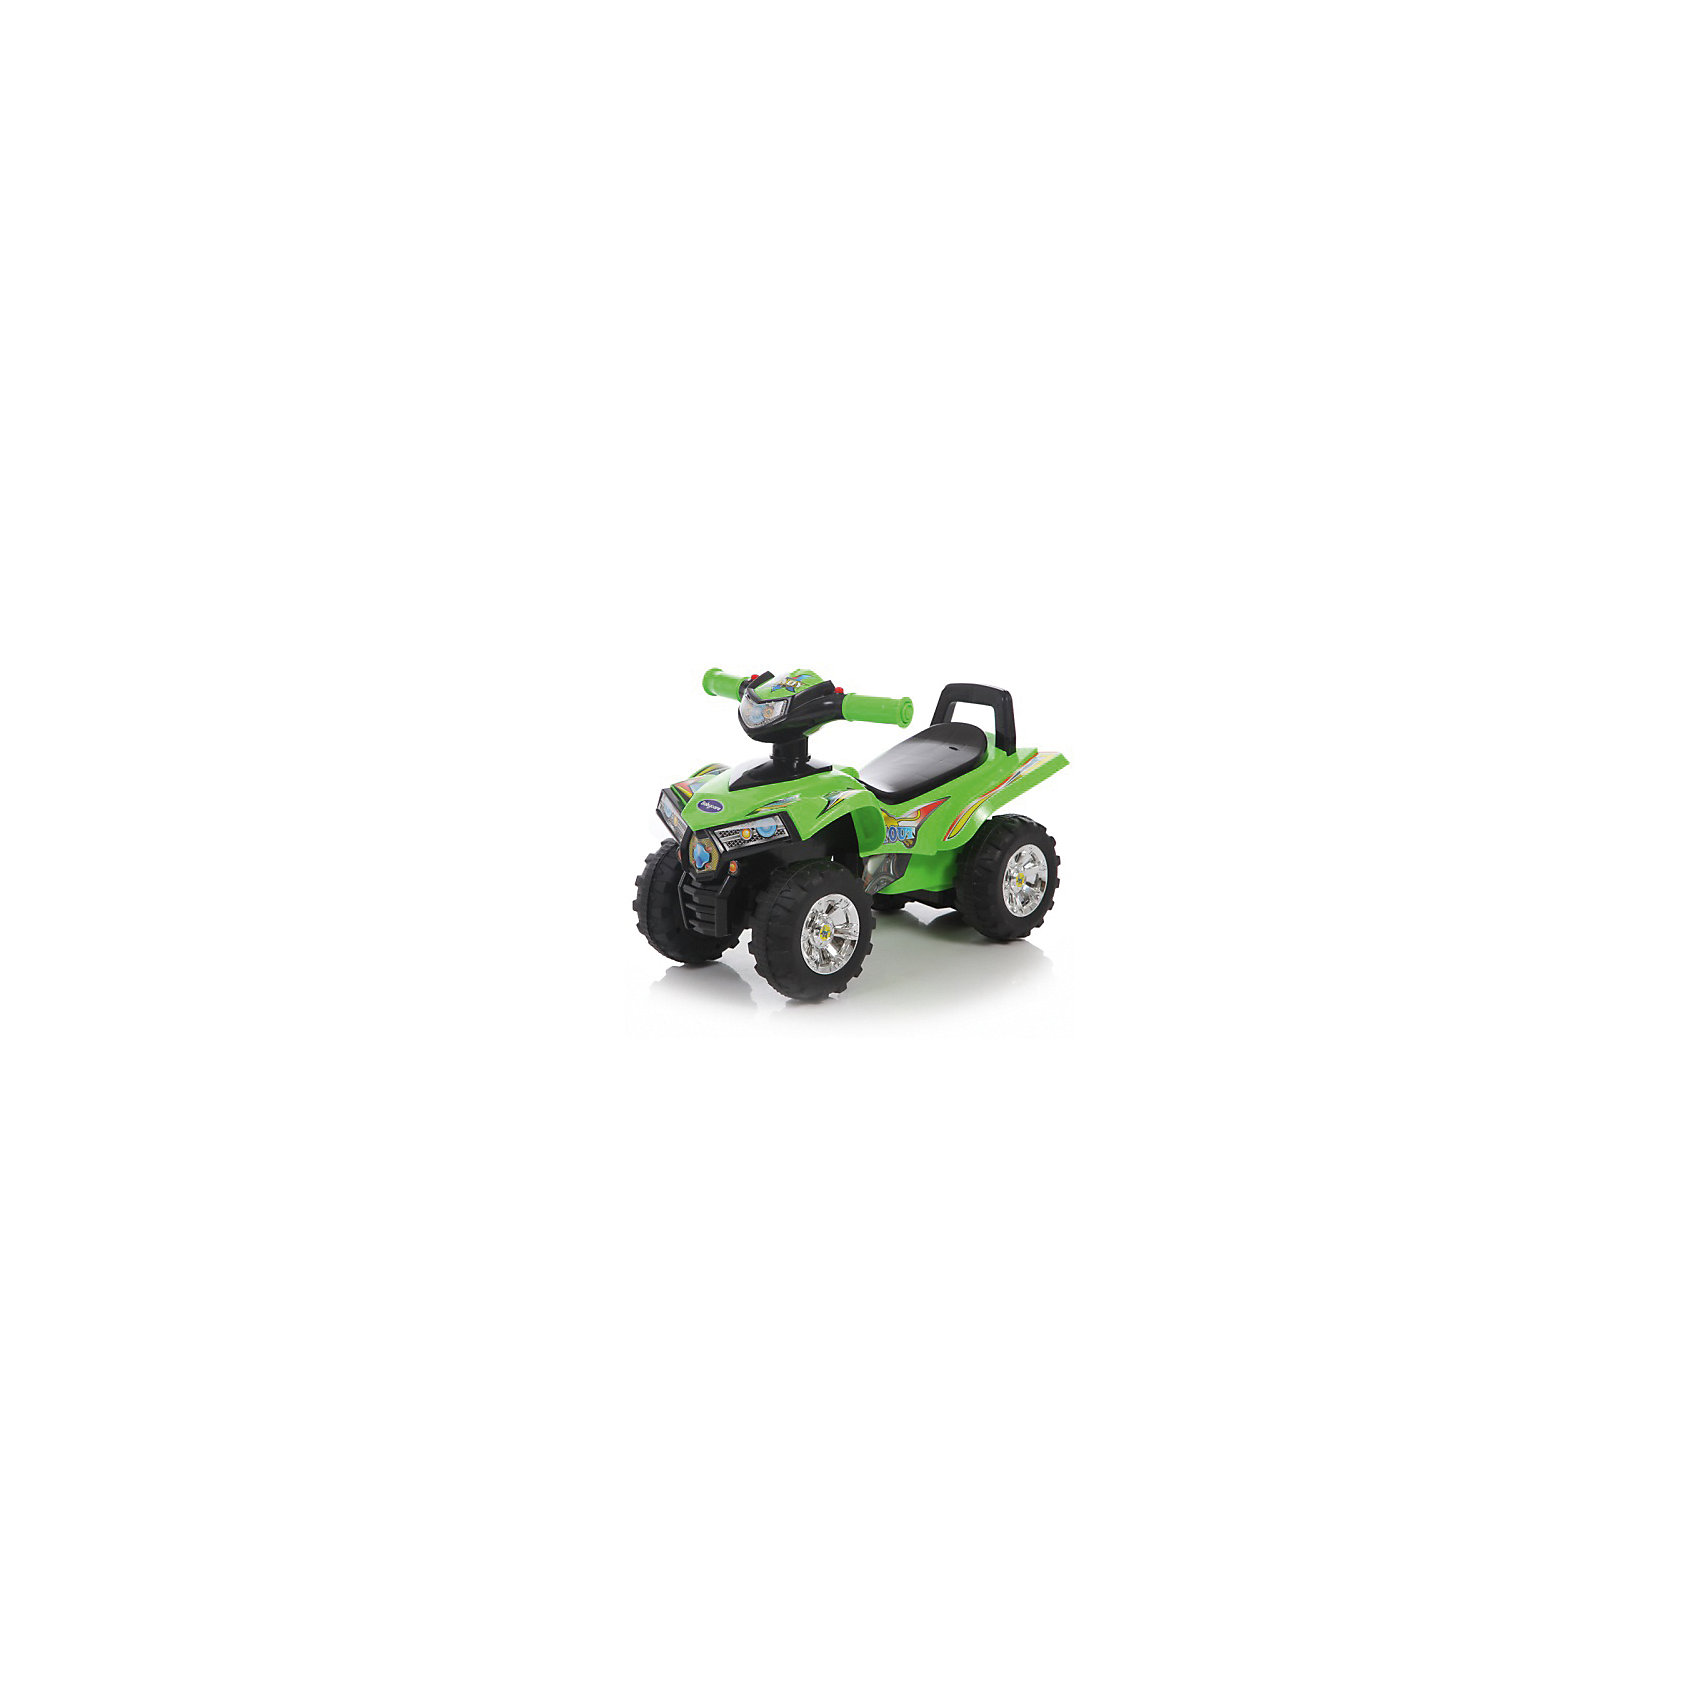 Каталка детская Super ATV, зеленая, Baby Care